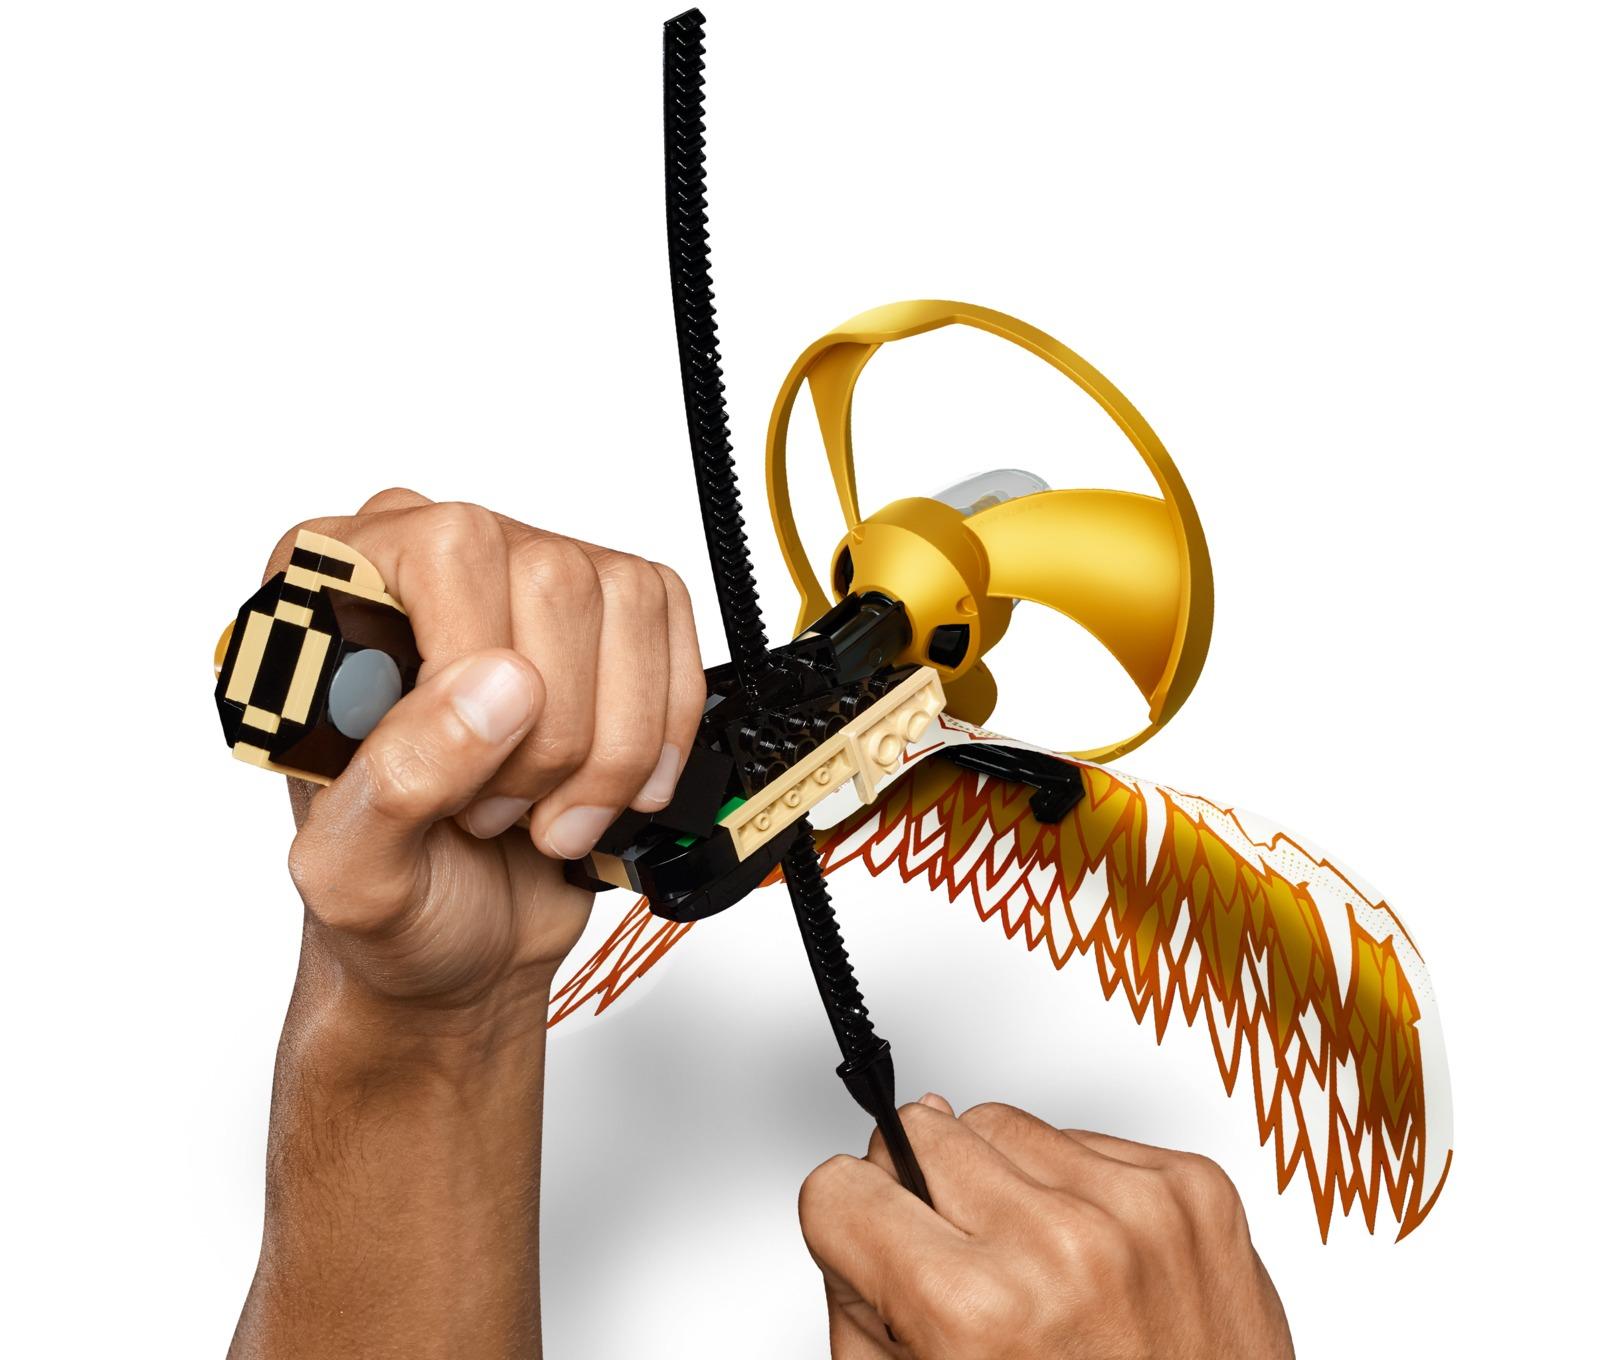 LEGO Ninjago - Golden Dragon Master (70644) image